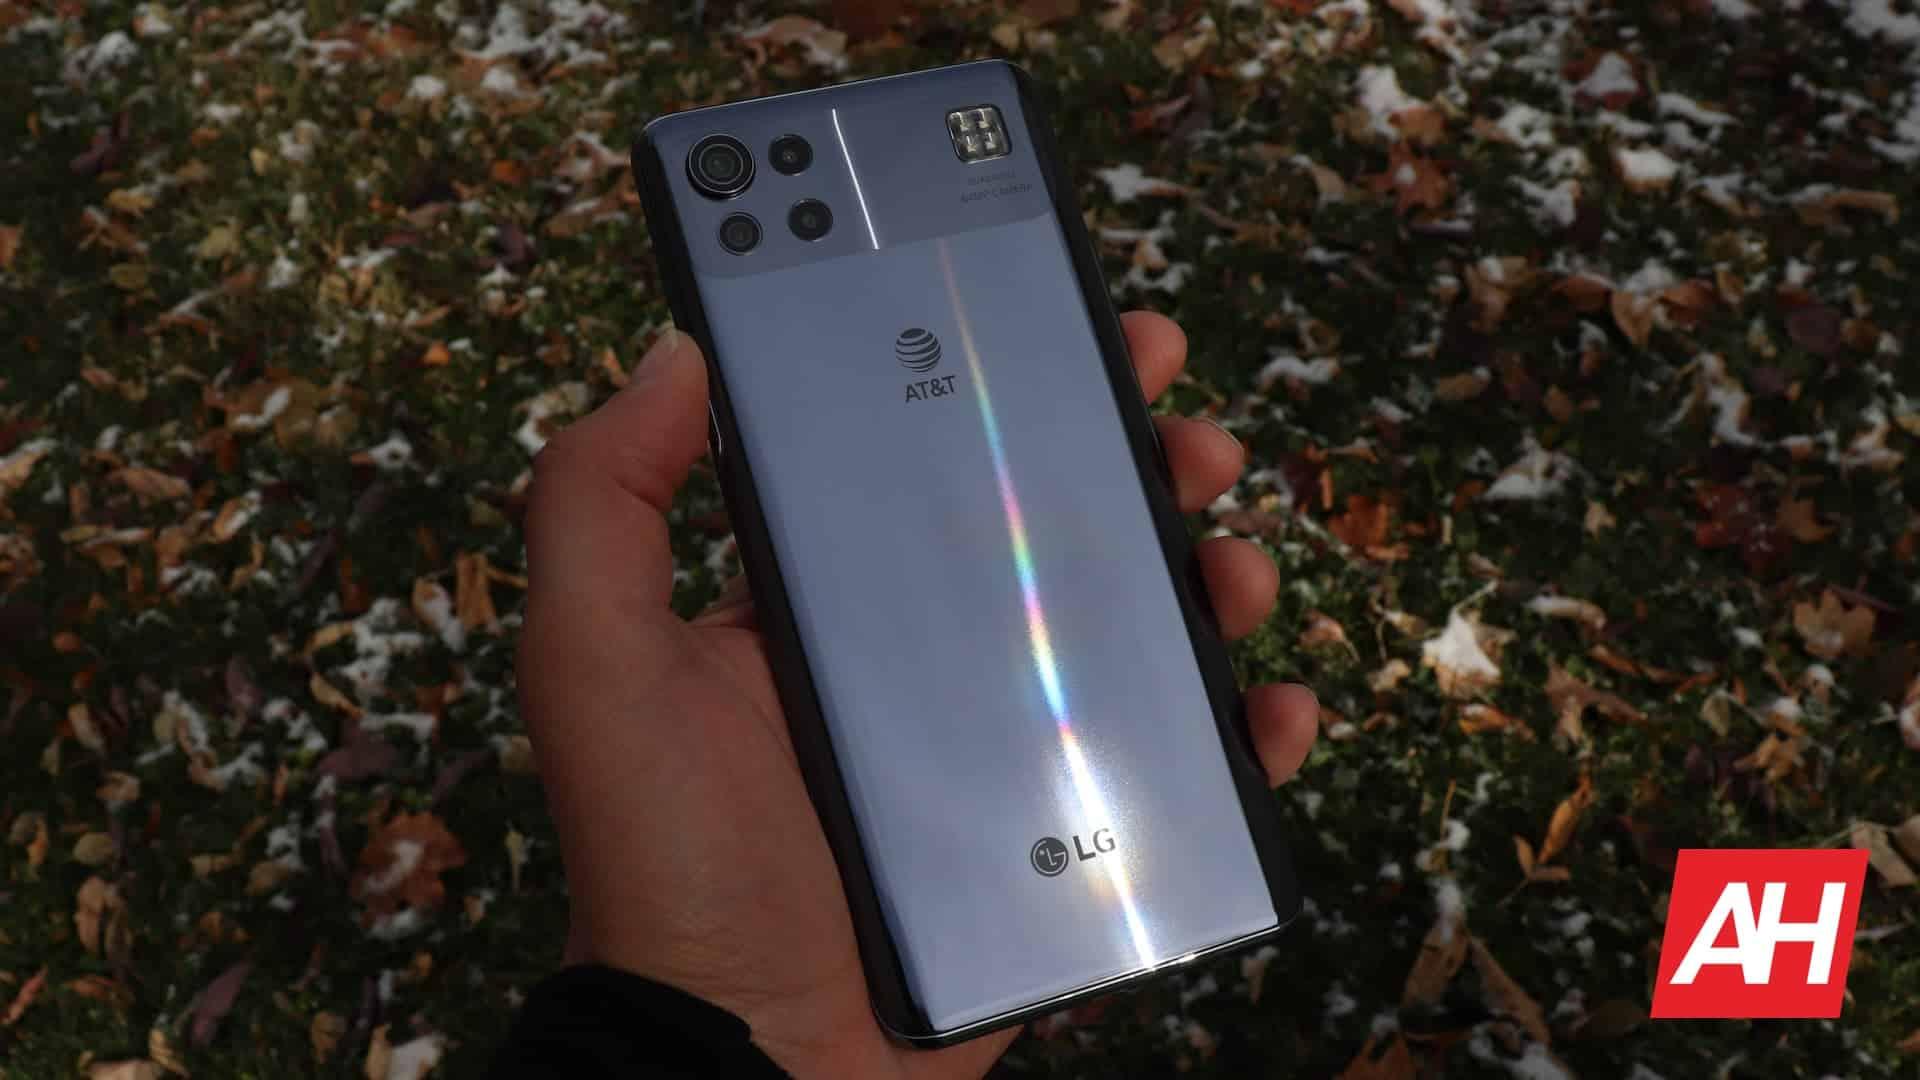 08 LG K92 5G Review Final DG AH 2020